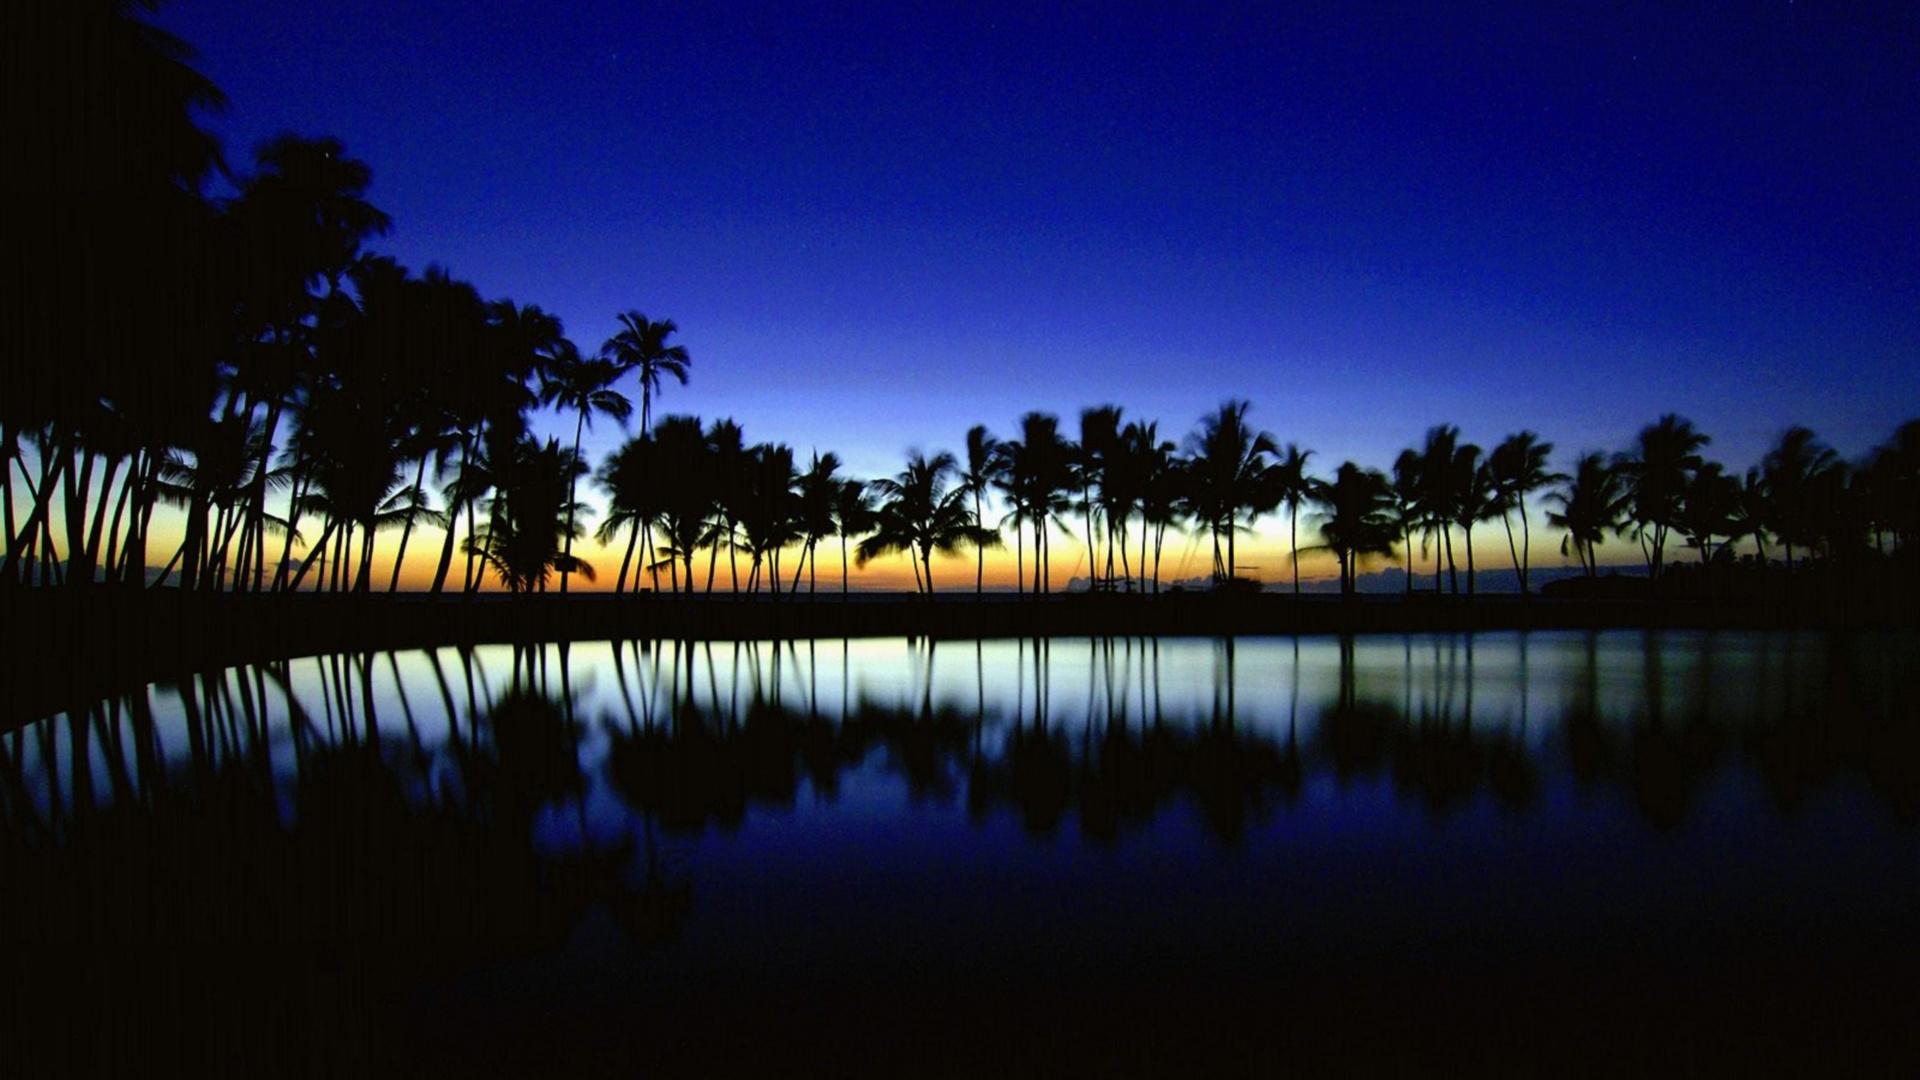 1080p Full Hd Backgrounds Screen Desktop Beach Scenery Hawaii Pictures Tropical Paradise Beach